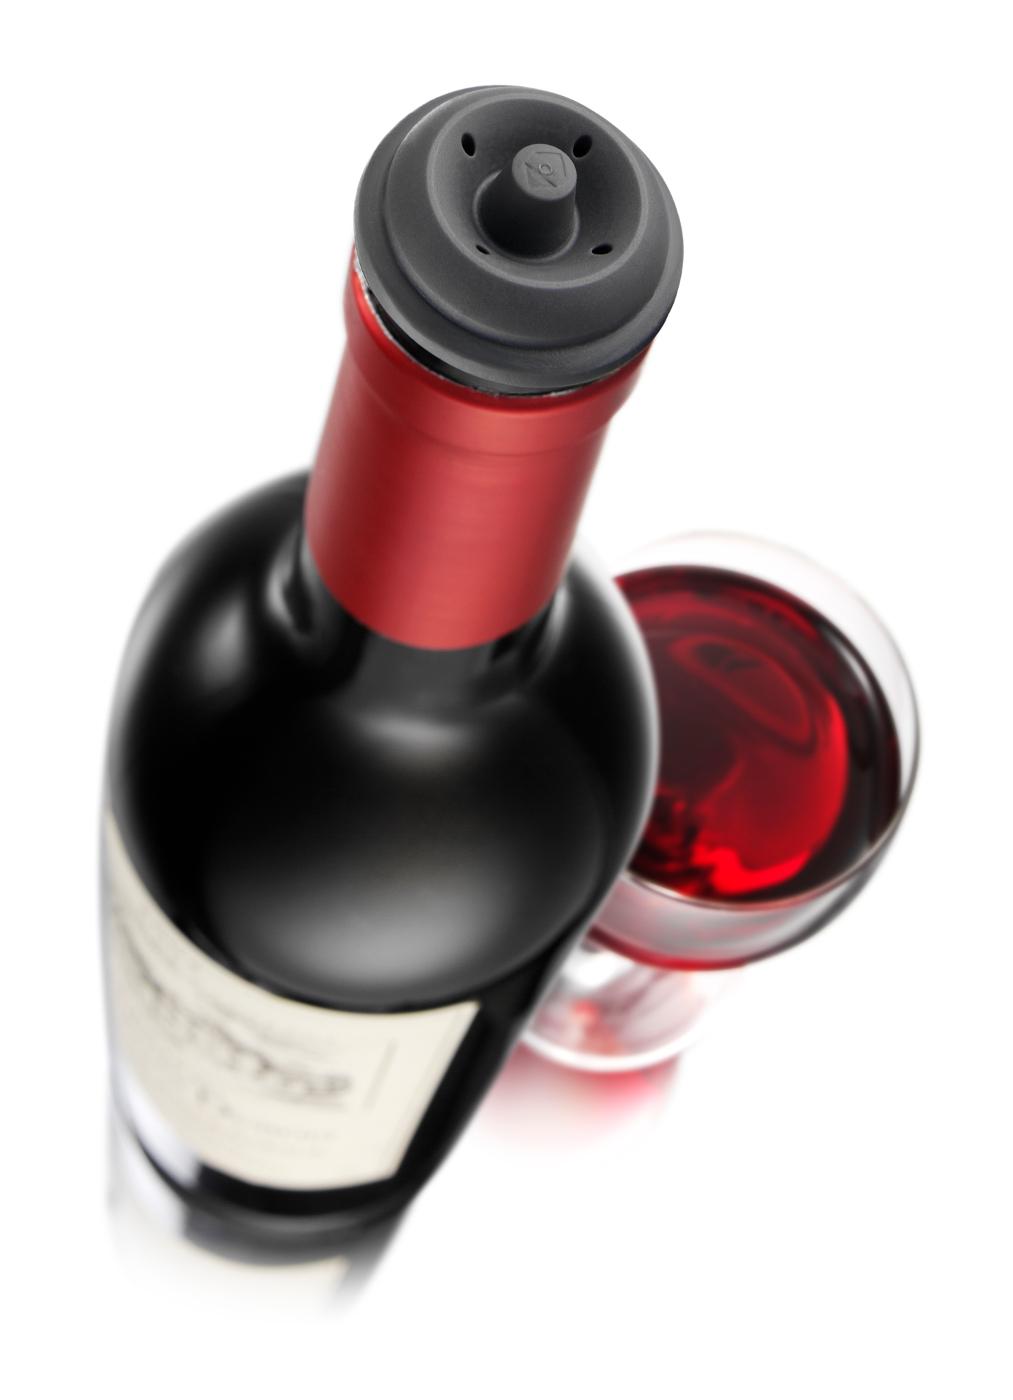 new product 018a5 ee7e6 Vacu Vin Wine Stopper korkit 2 kpl - Crema